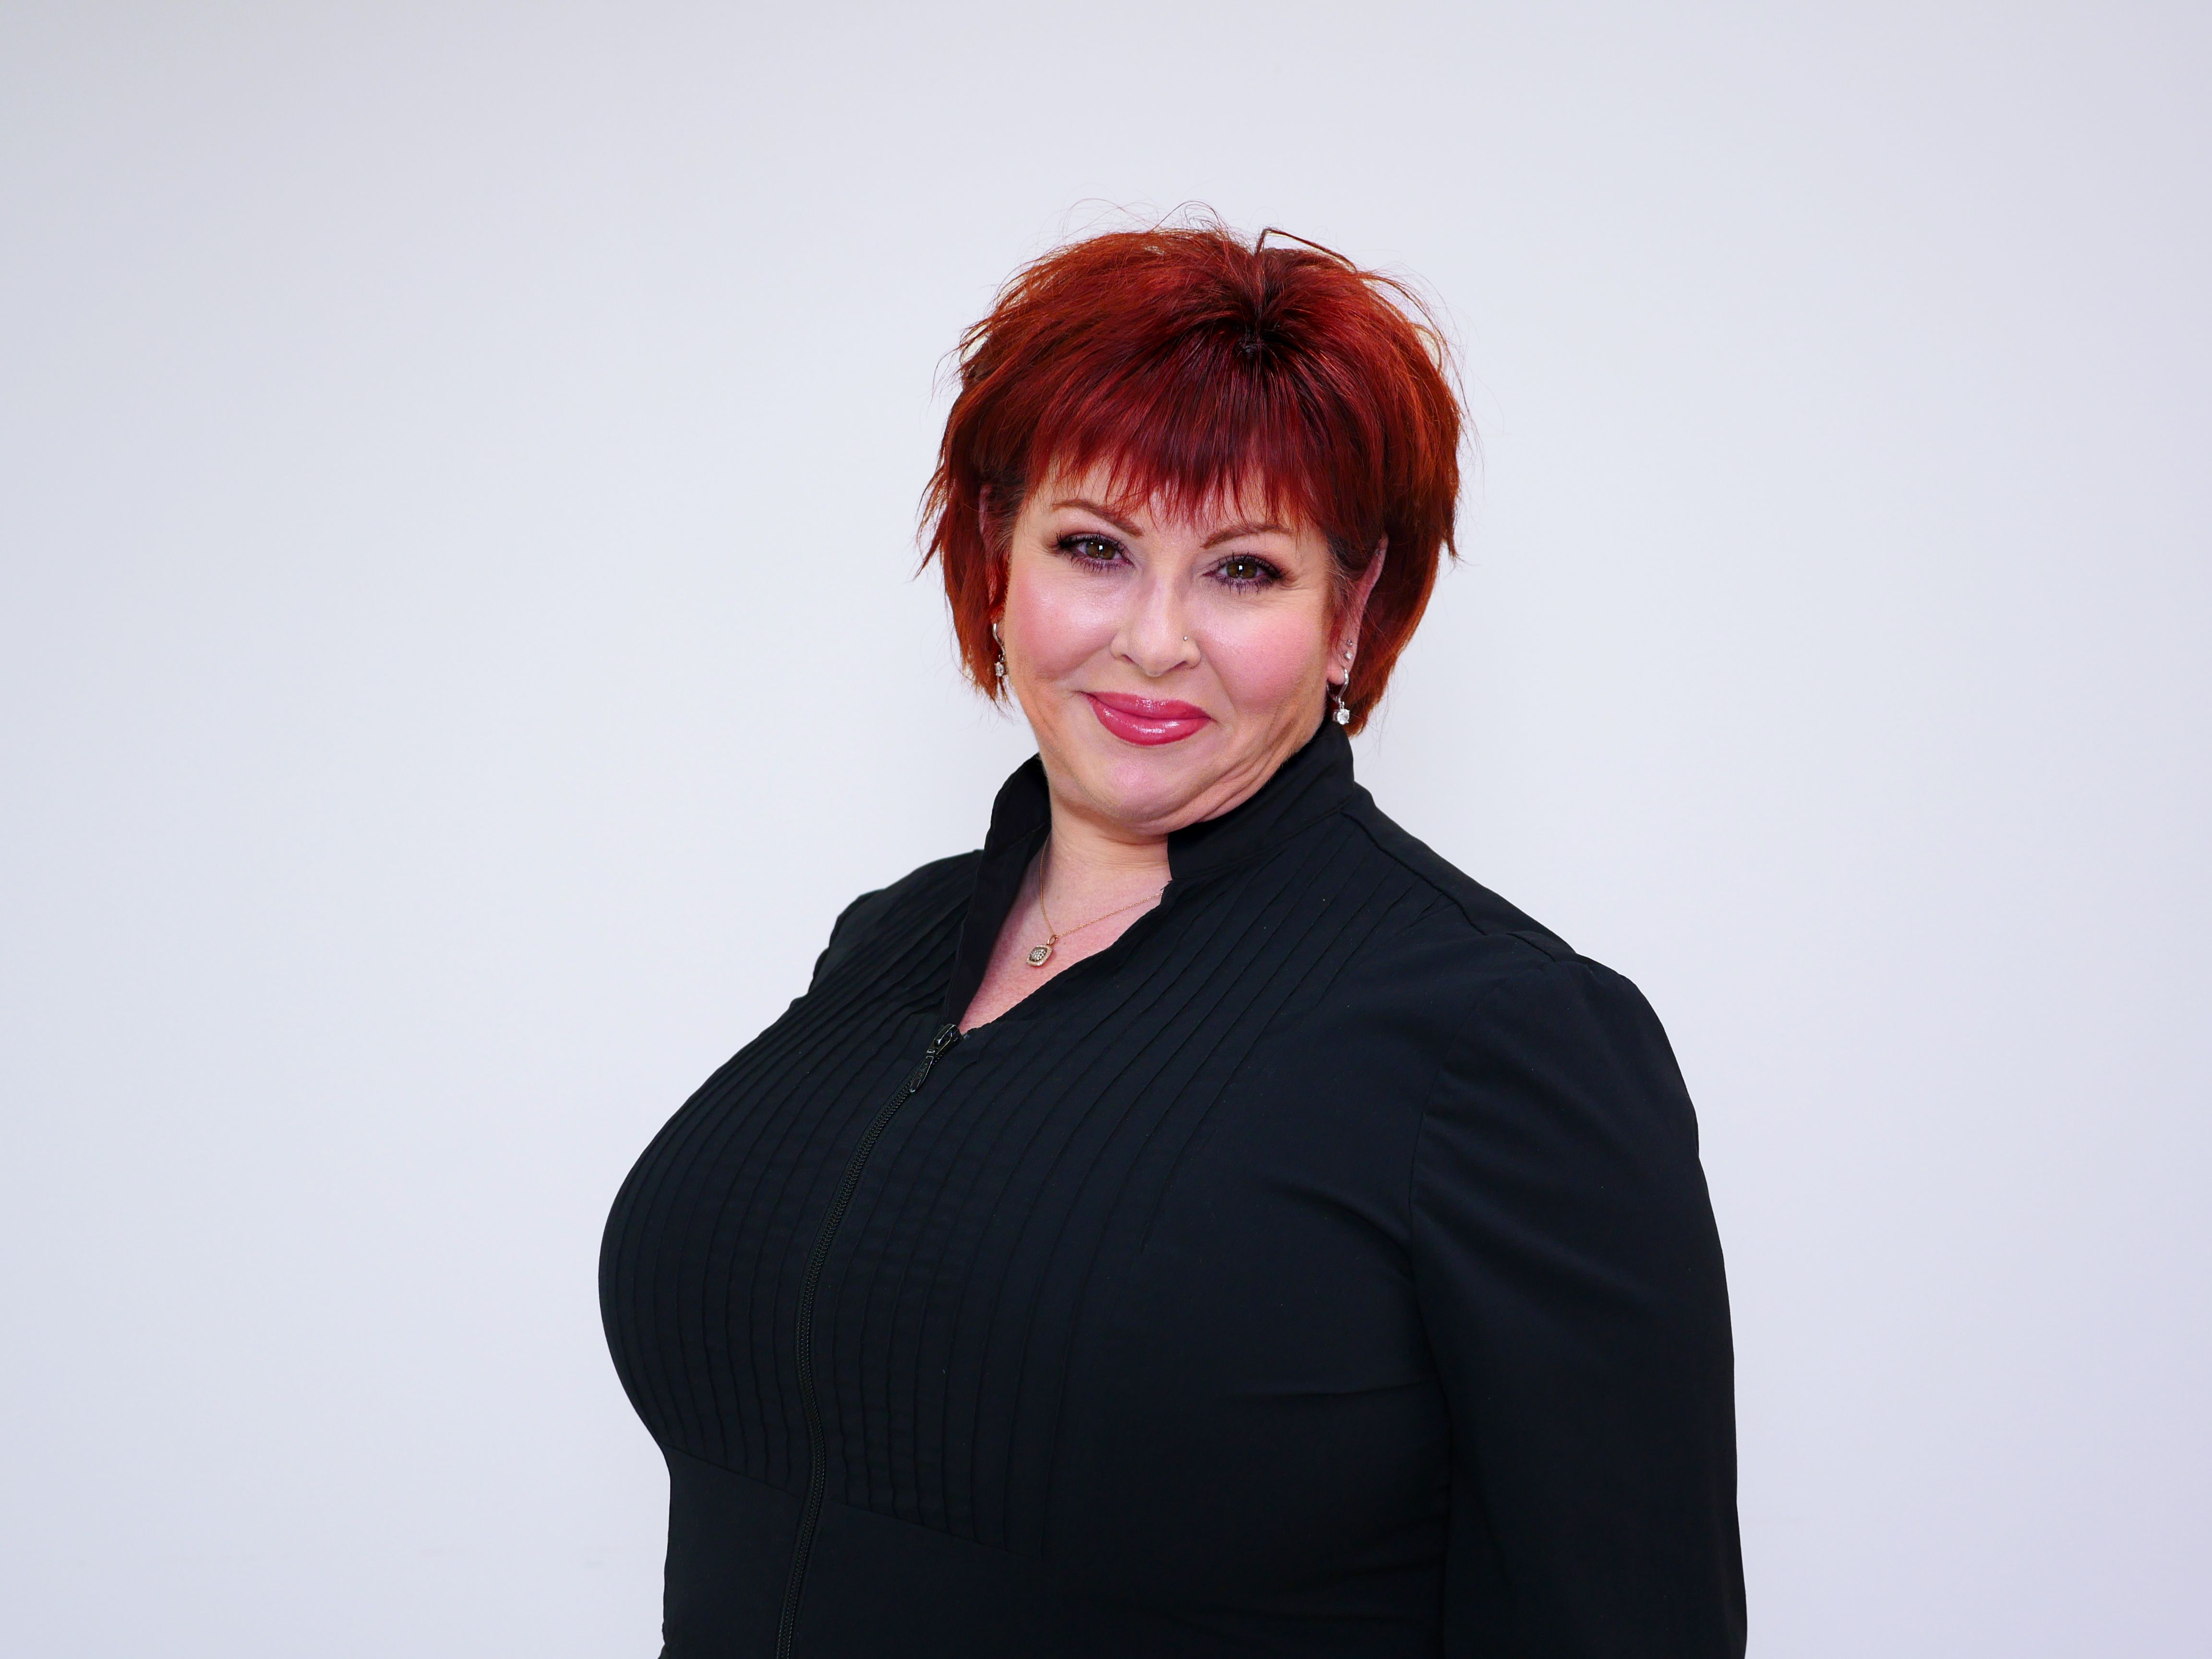 Fantástico Laser Hair Removal State College Pa Fotos - Anatomía de ...